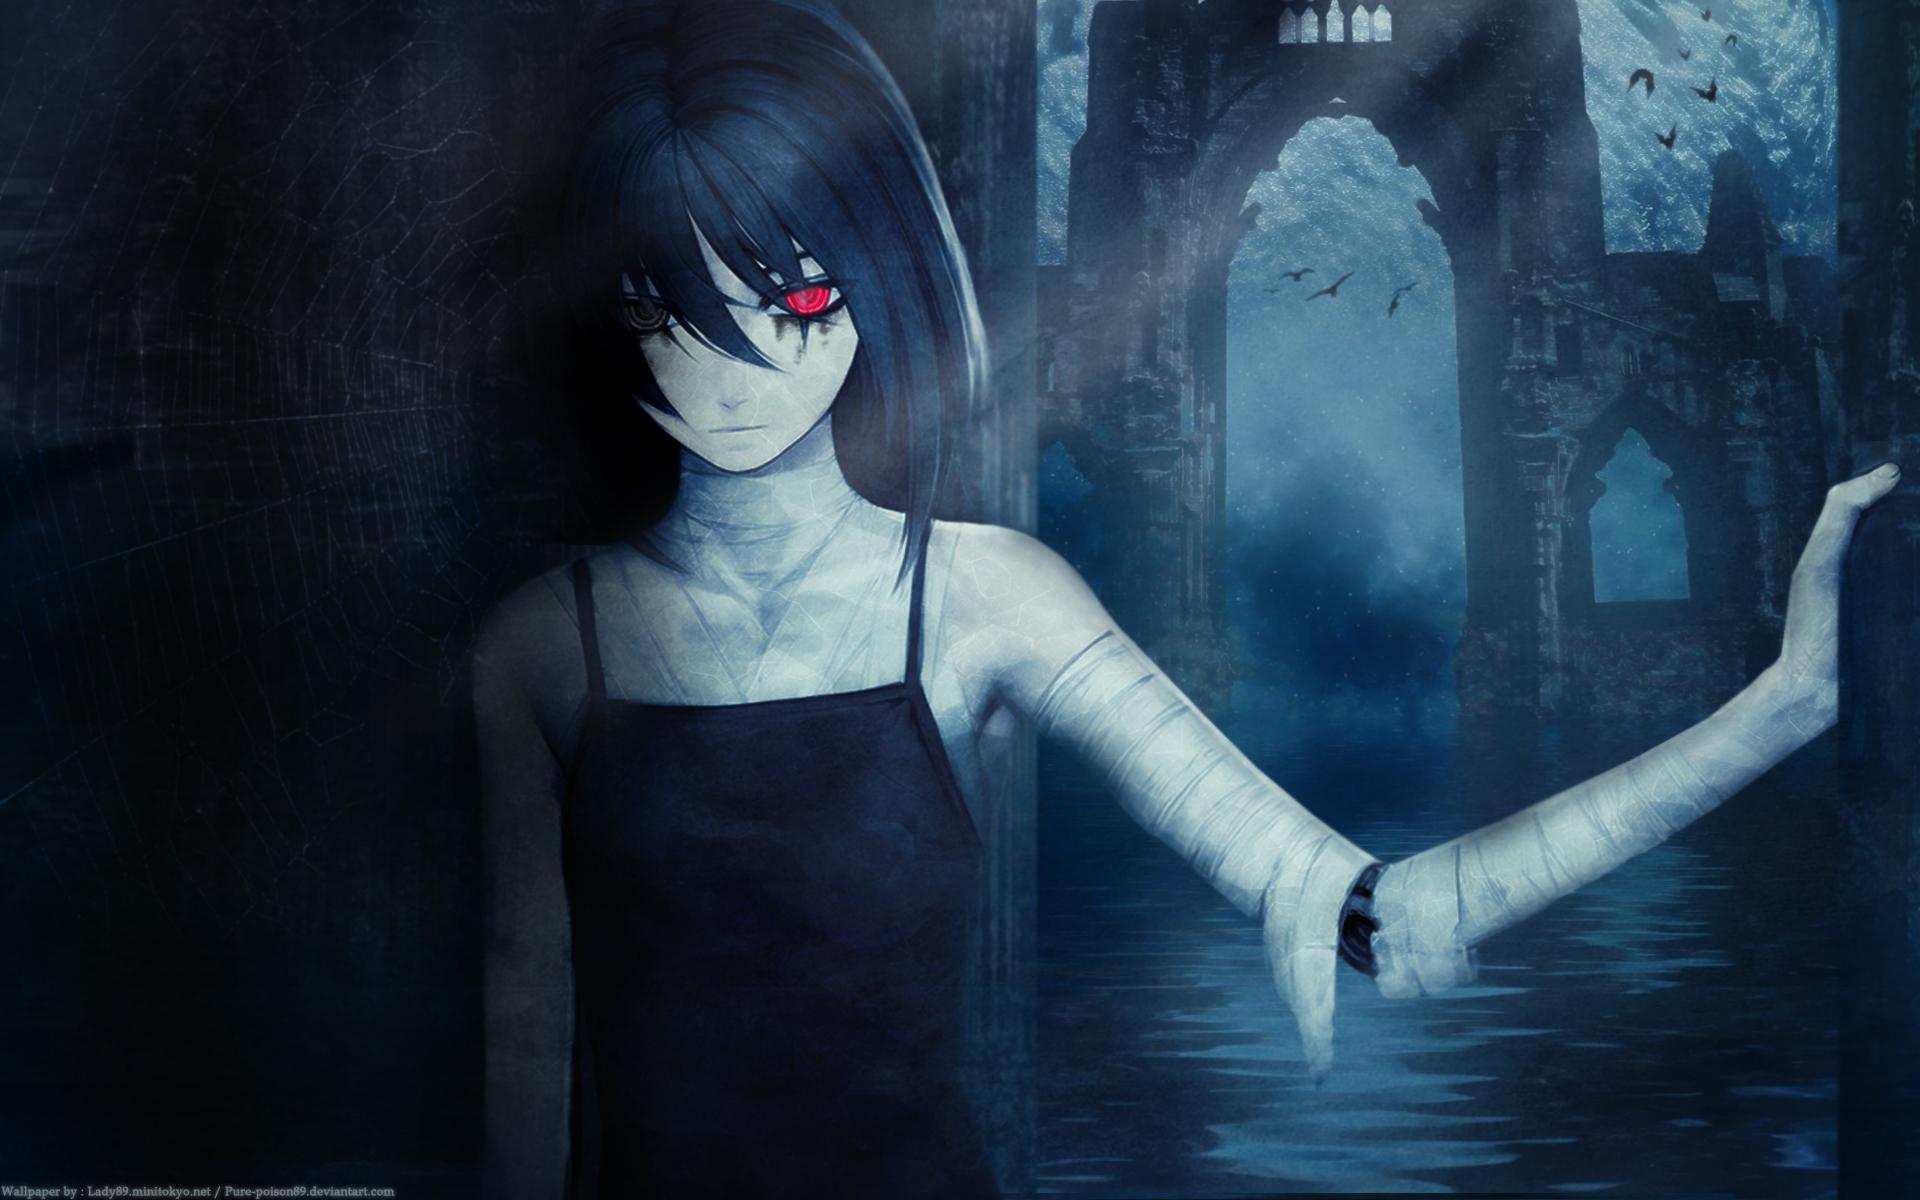 Evilness hd wallpaper background image 1920x1200 id - Wallpaper dark anime ...